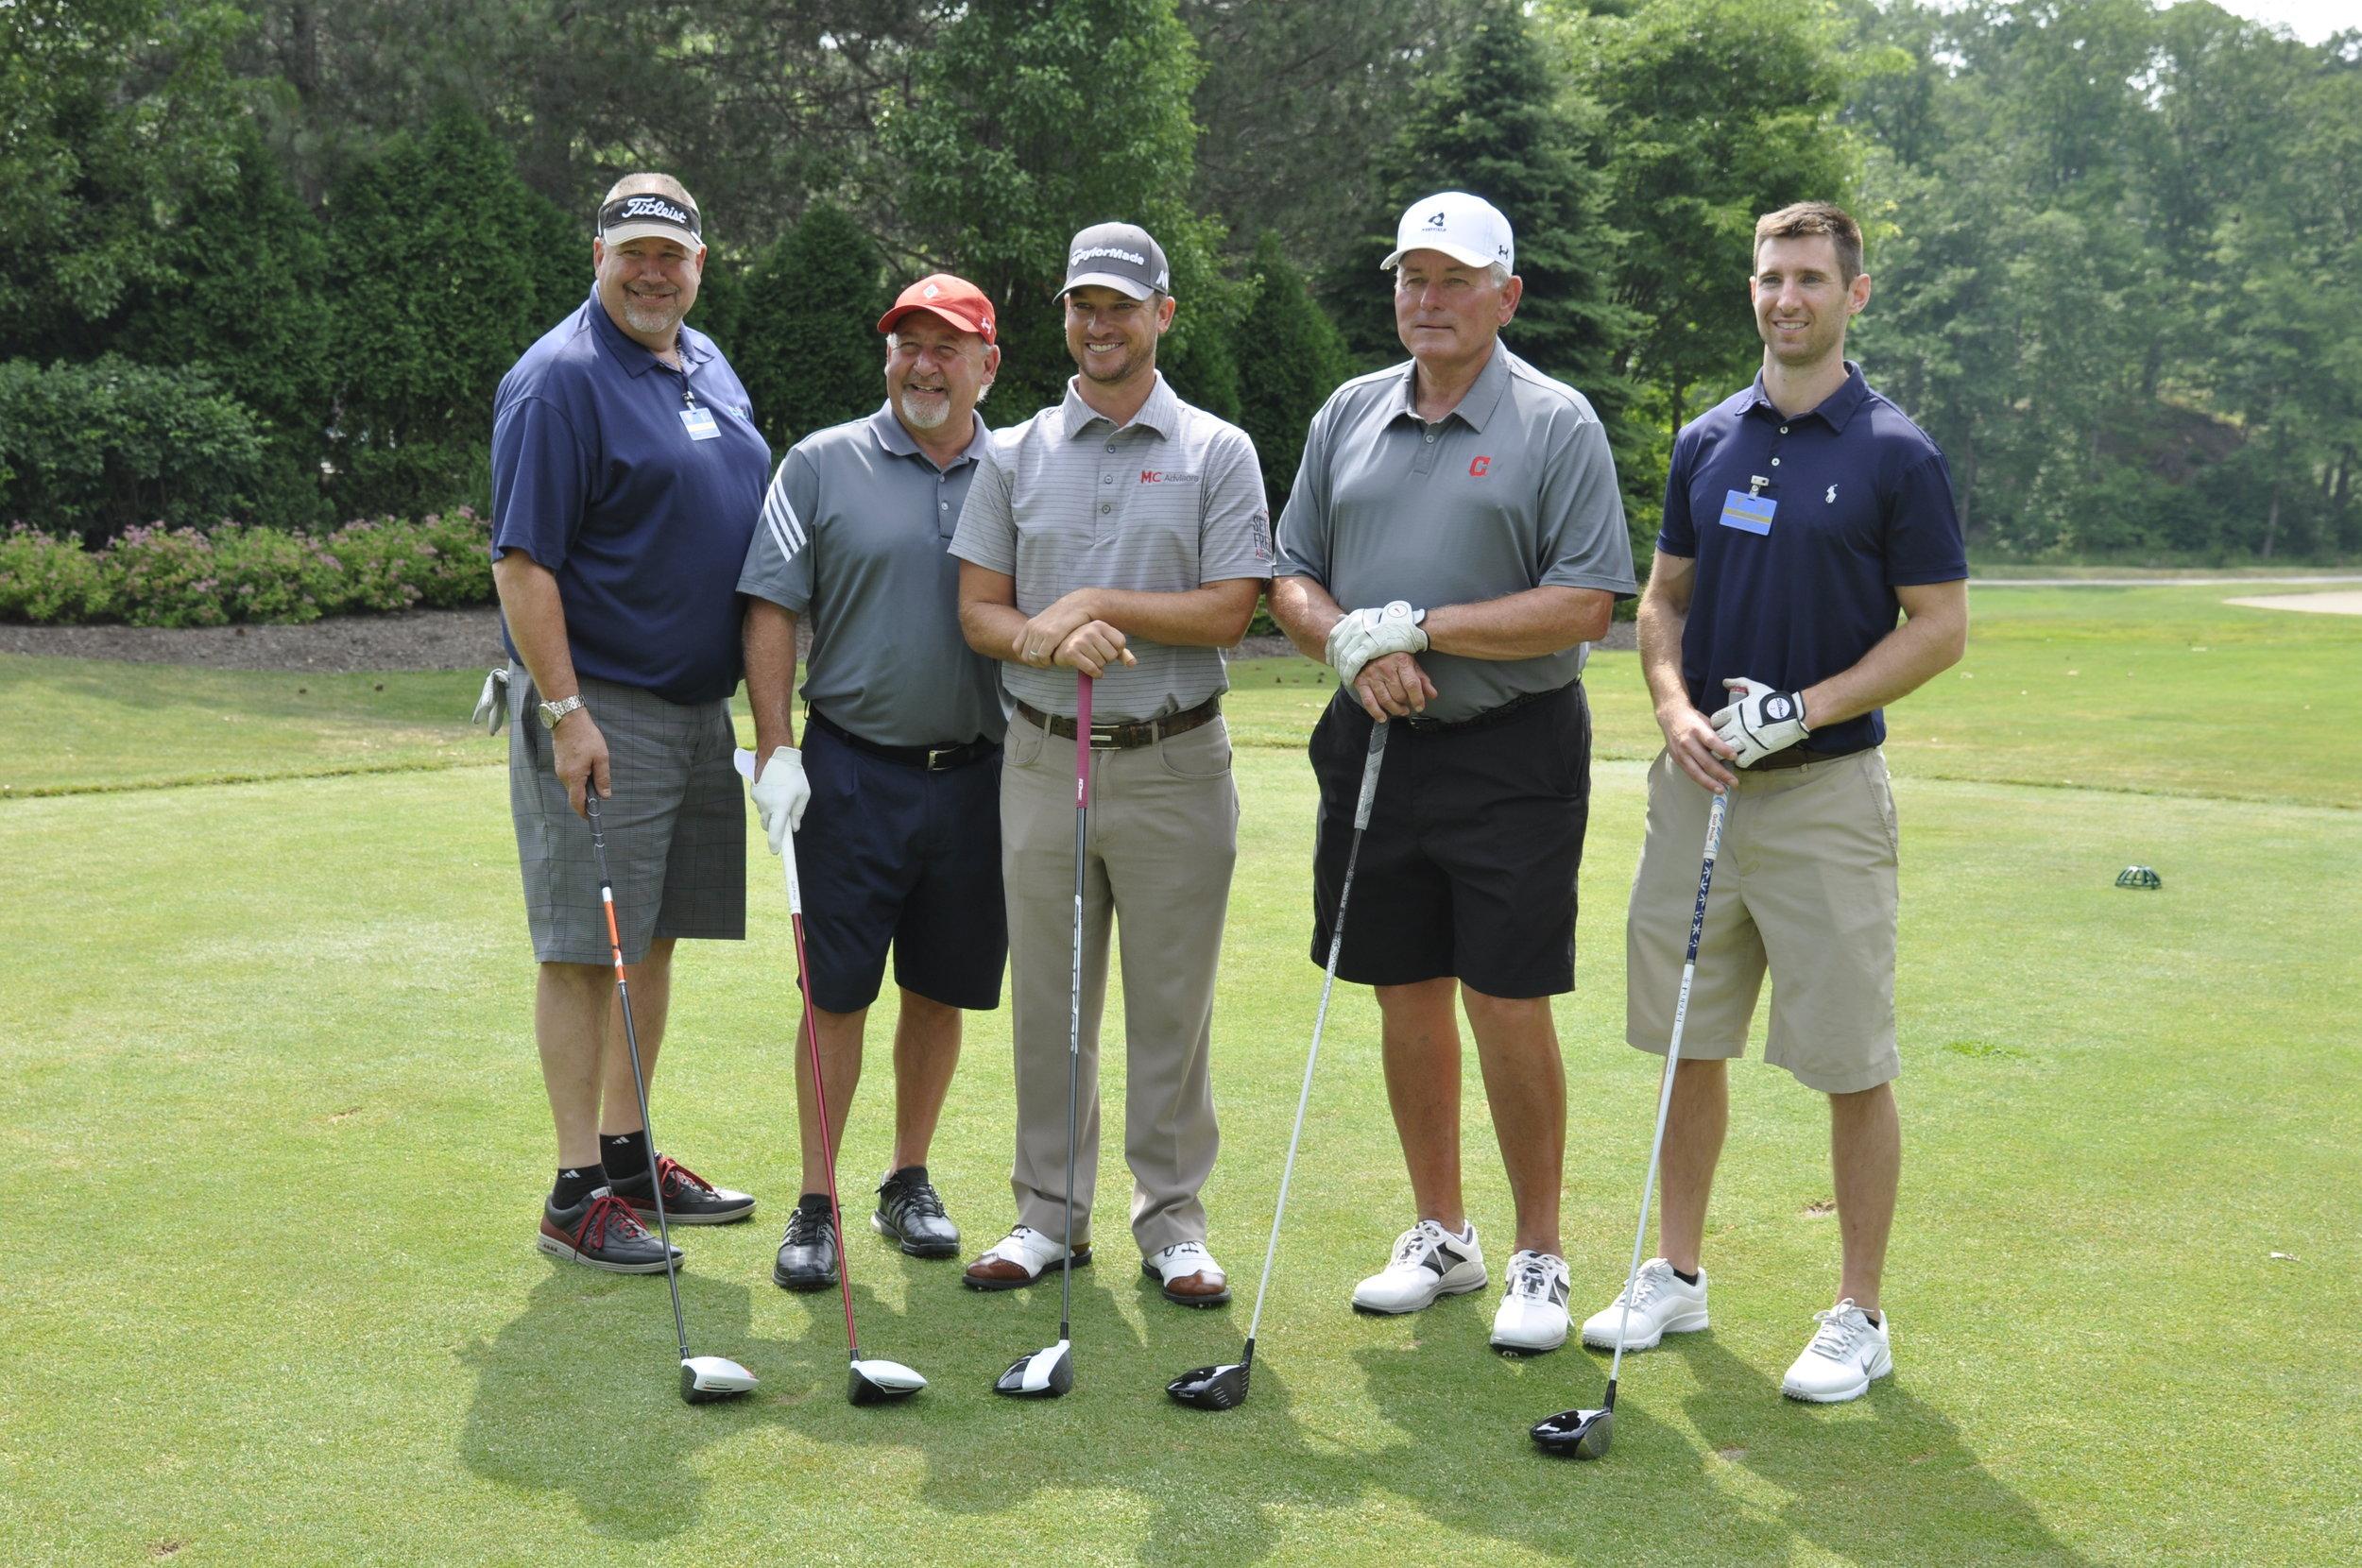 Jeff Deliere, Bob DiBiasio, Kyle Thompson, Mike Hargrove and John Patrichia.JPG